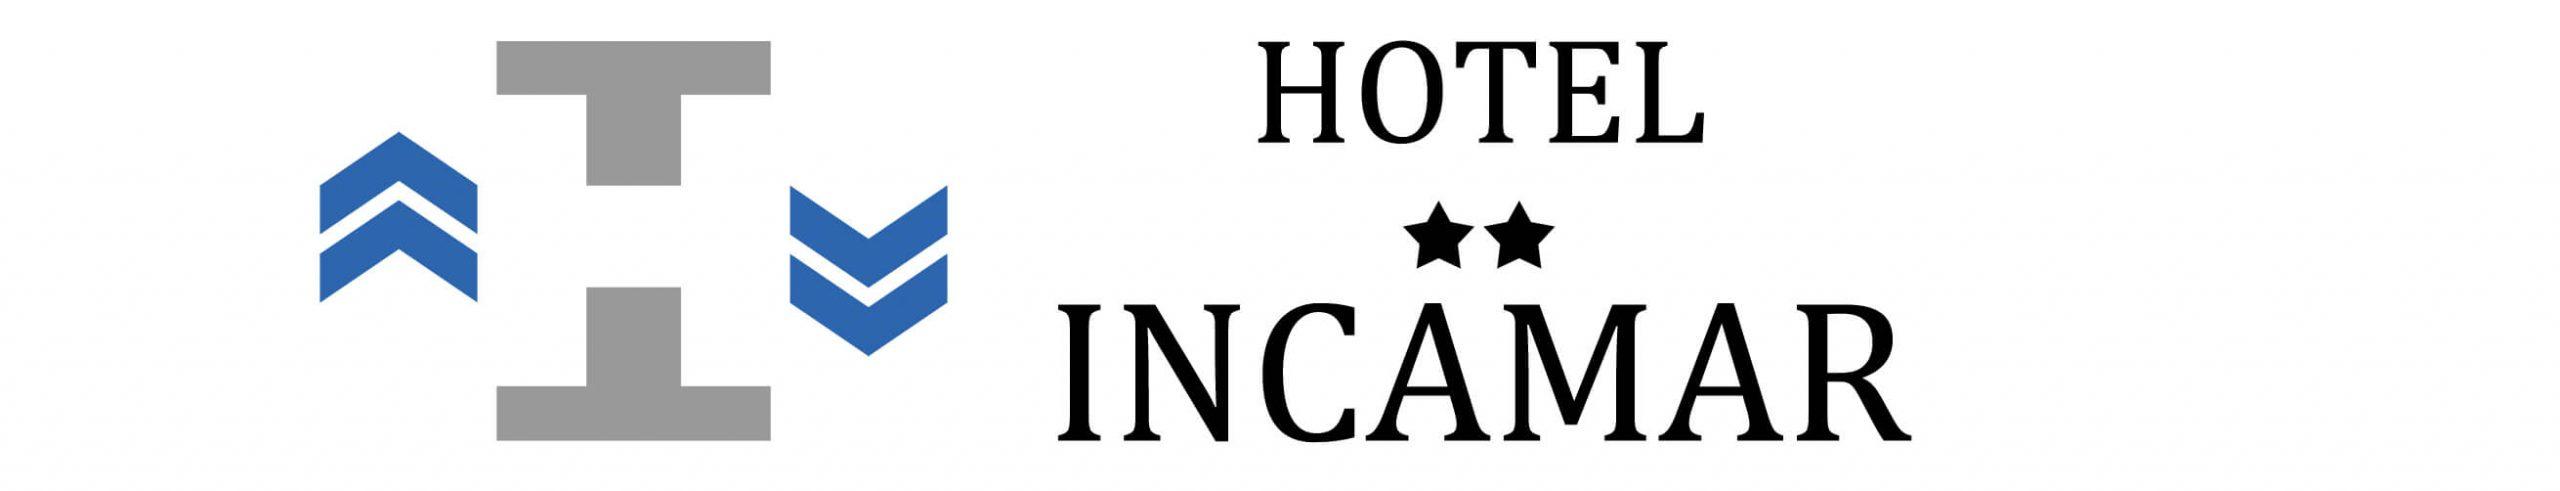 Hotel Incamar